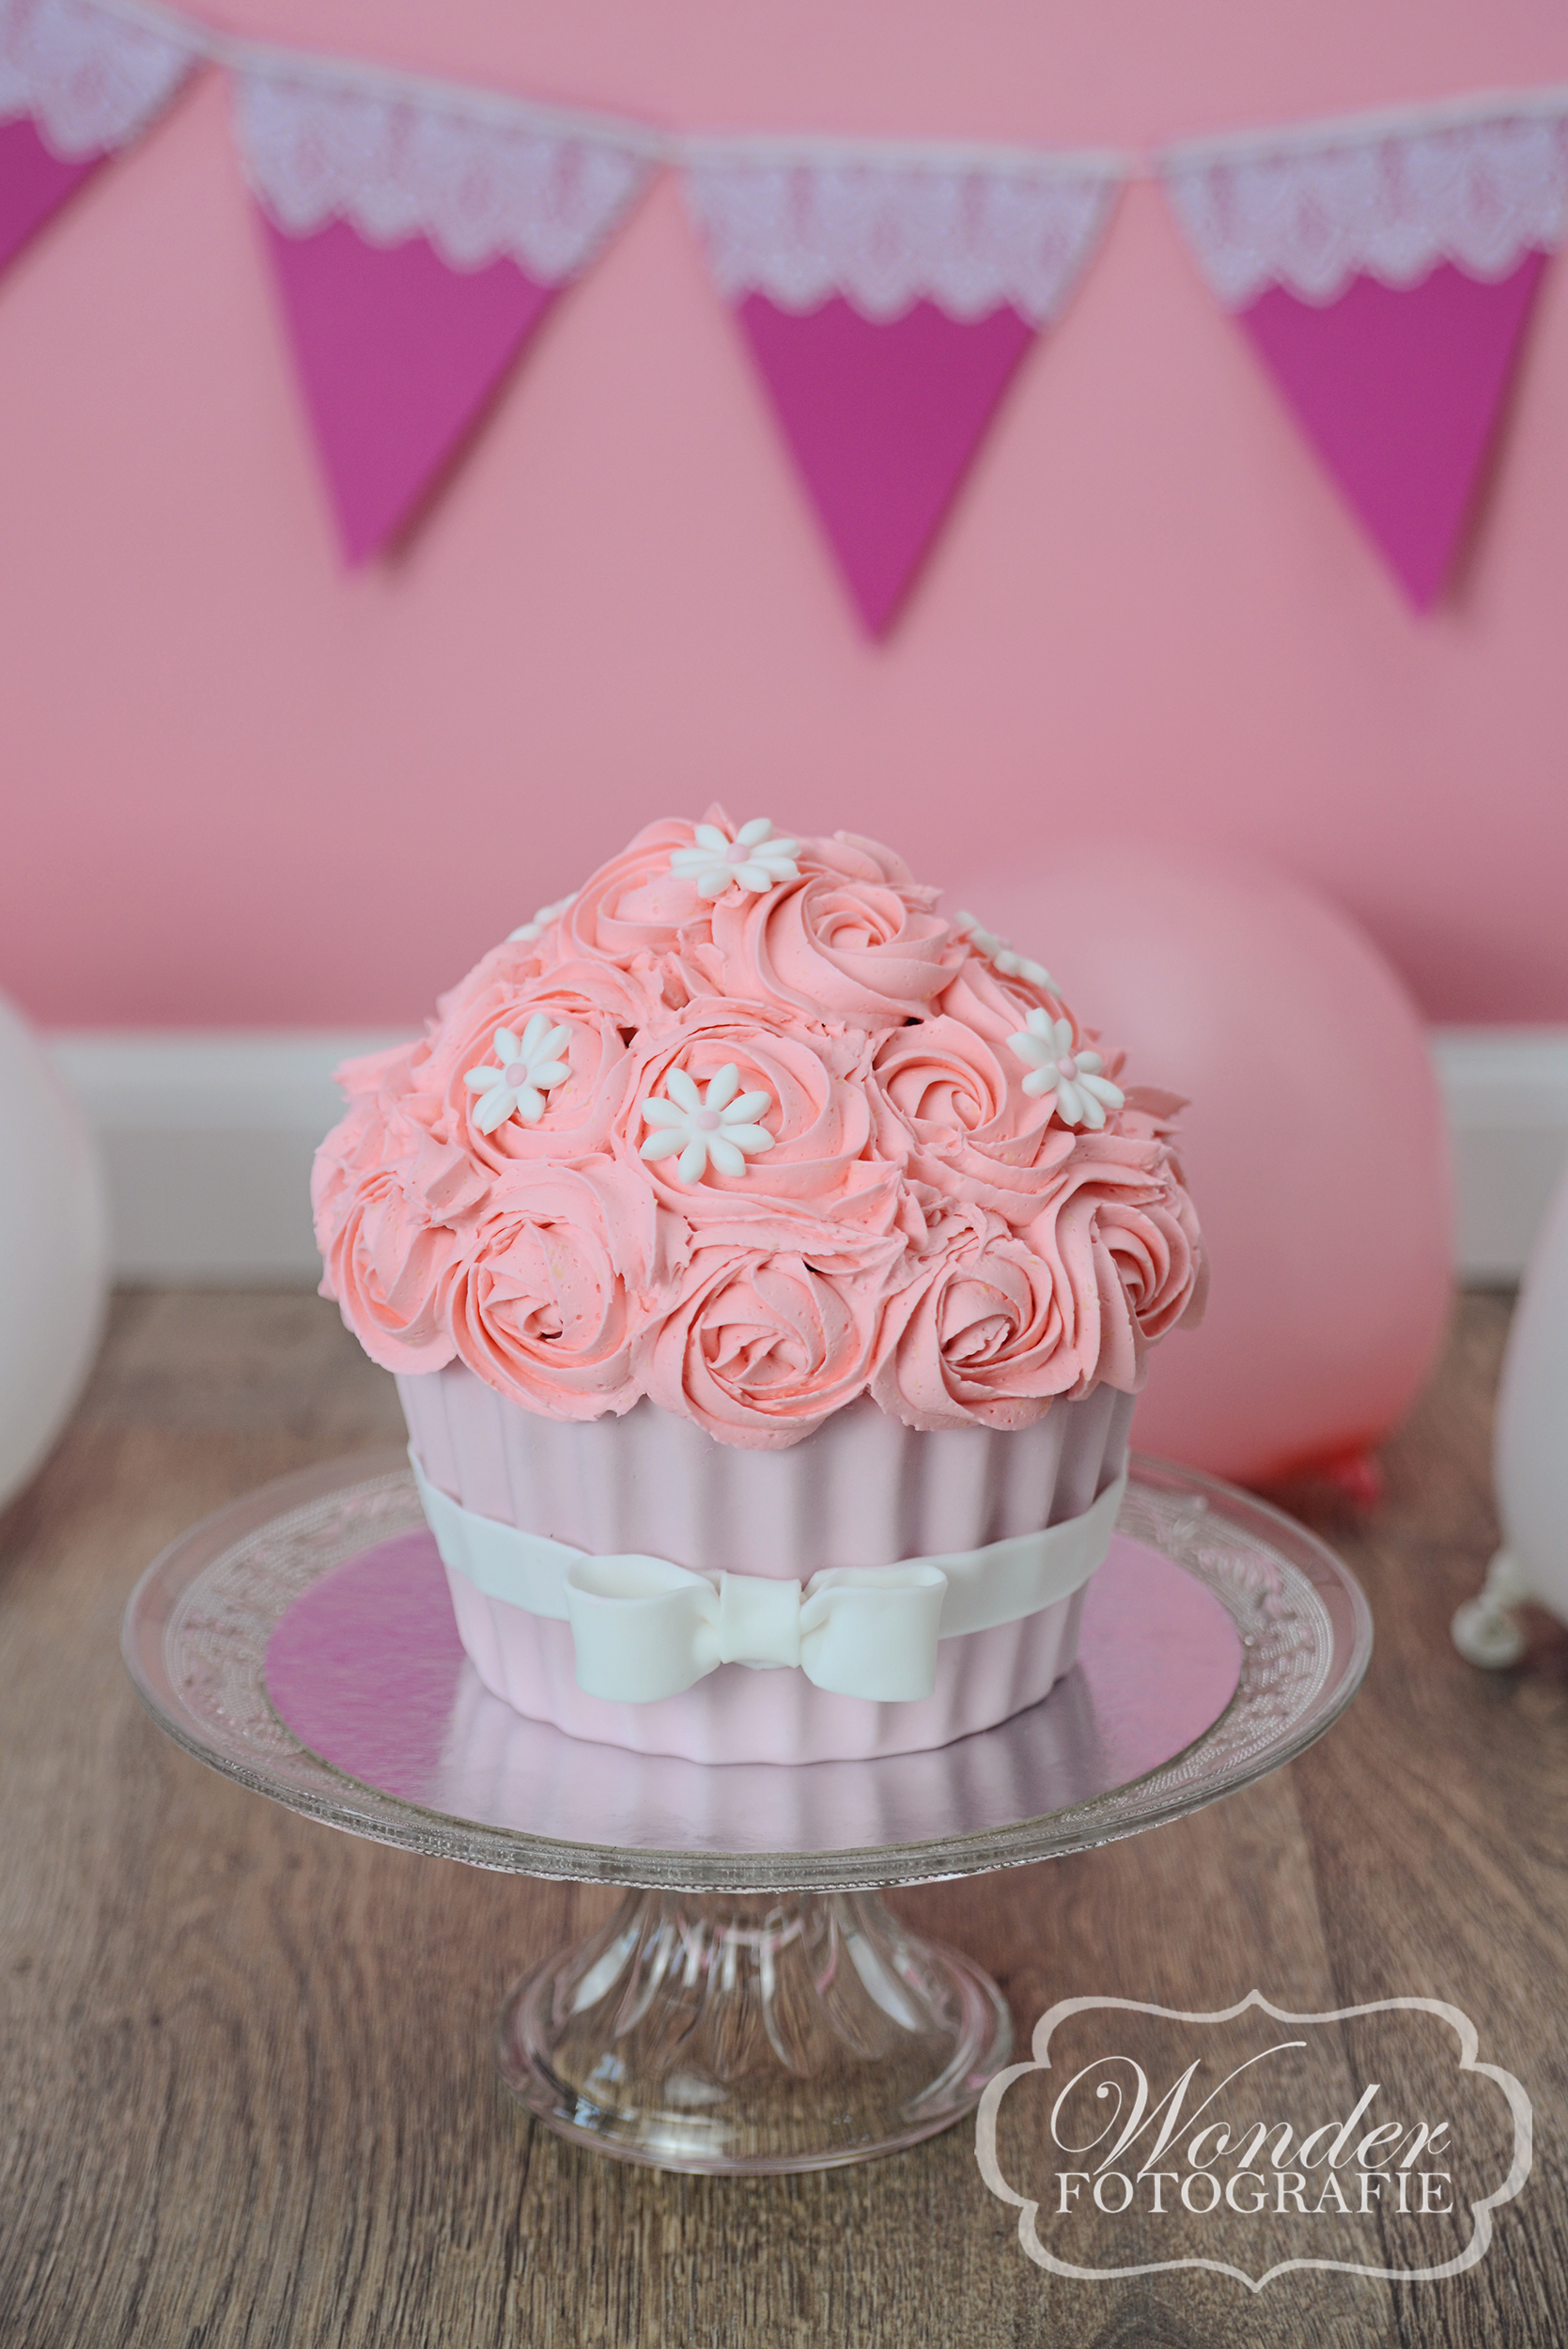 Cake Smash Roze - Wonder Fotografie